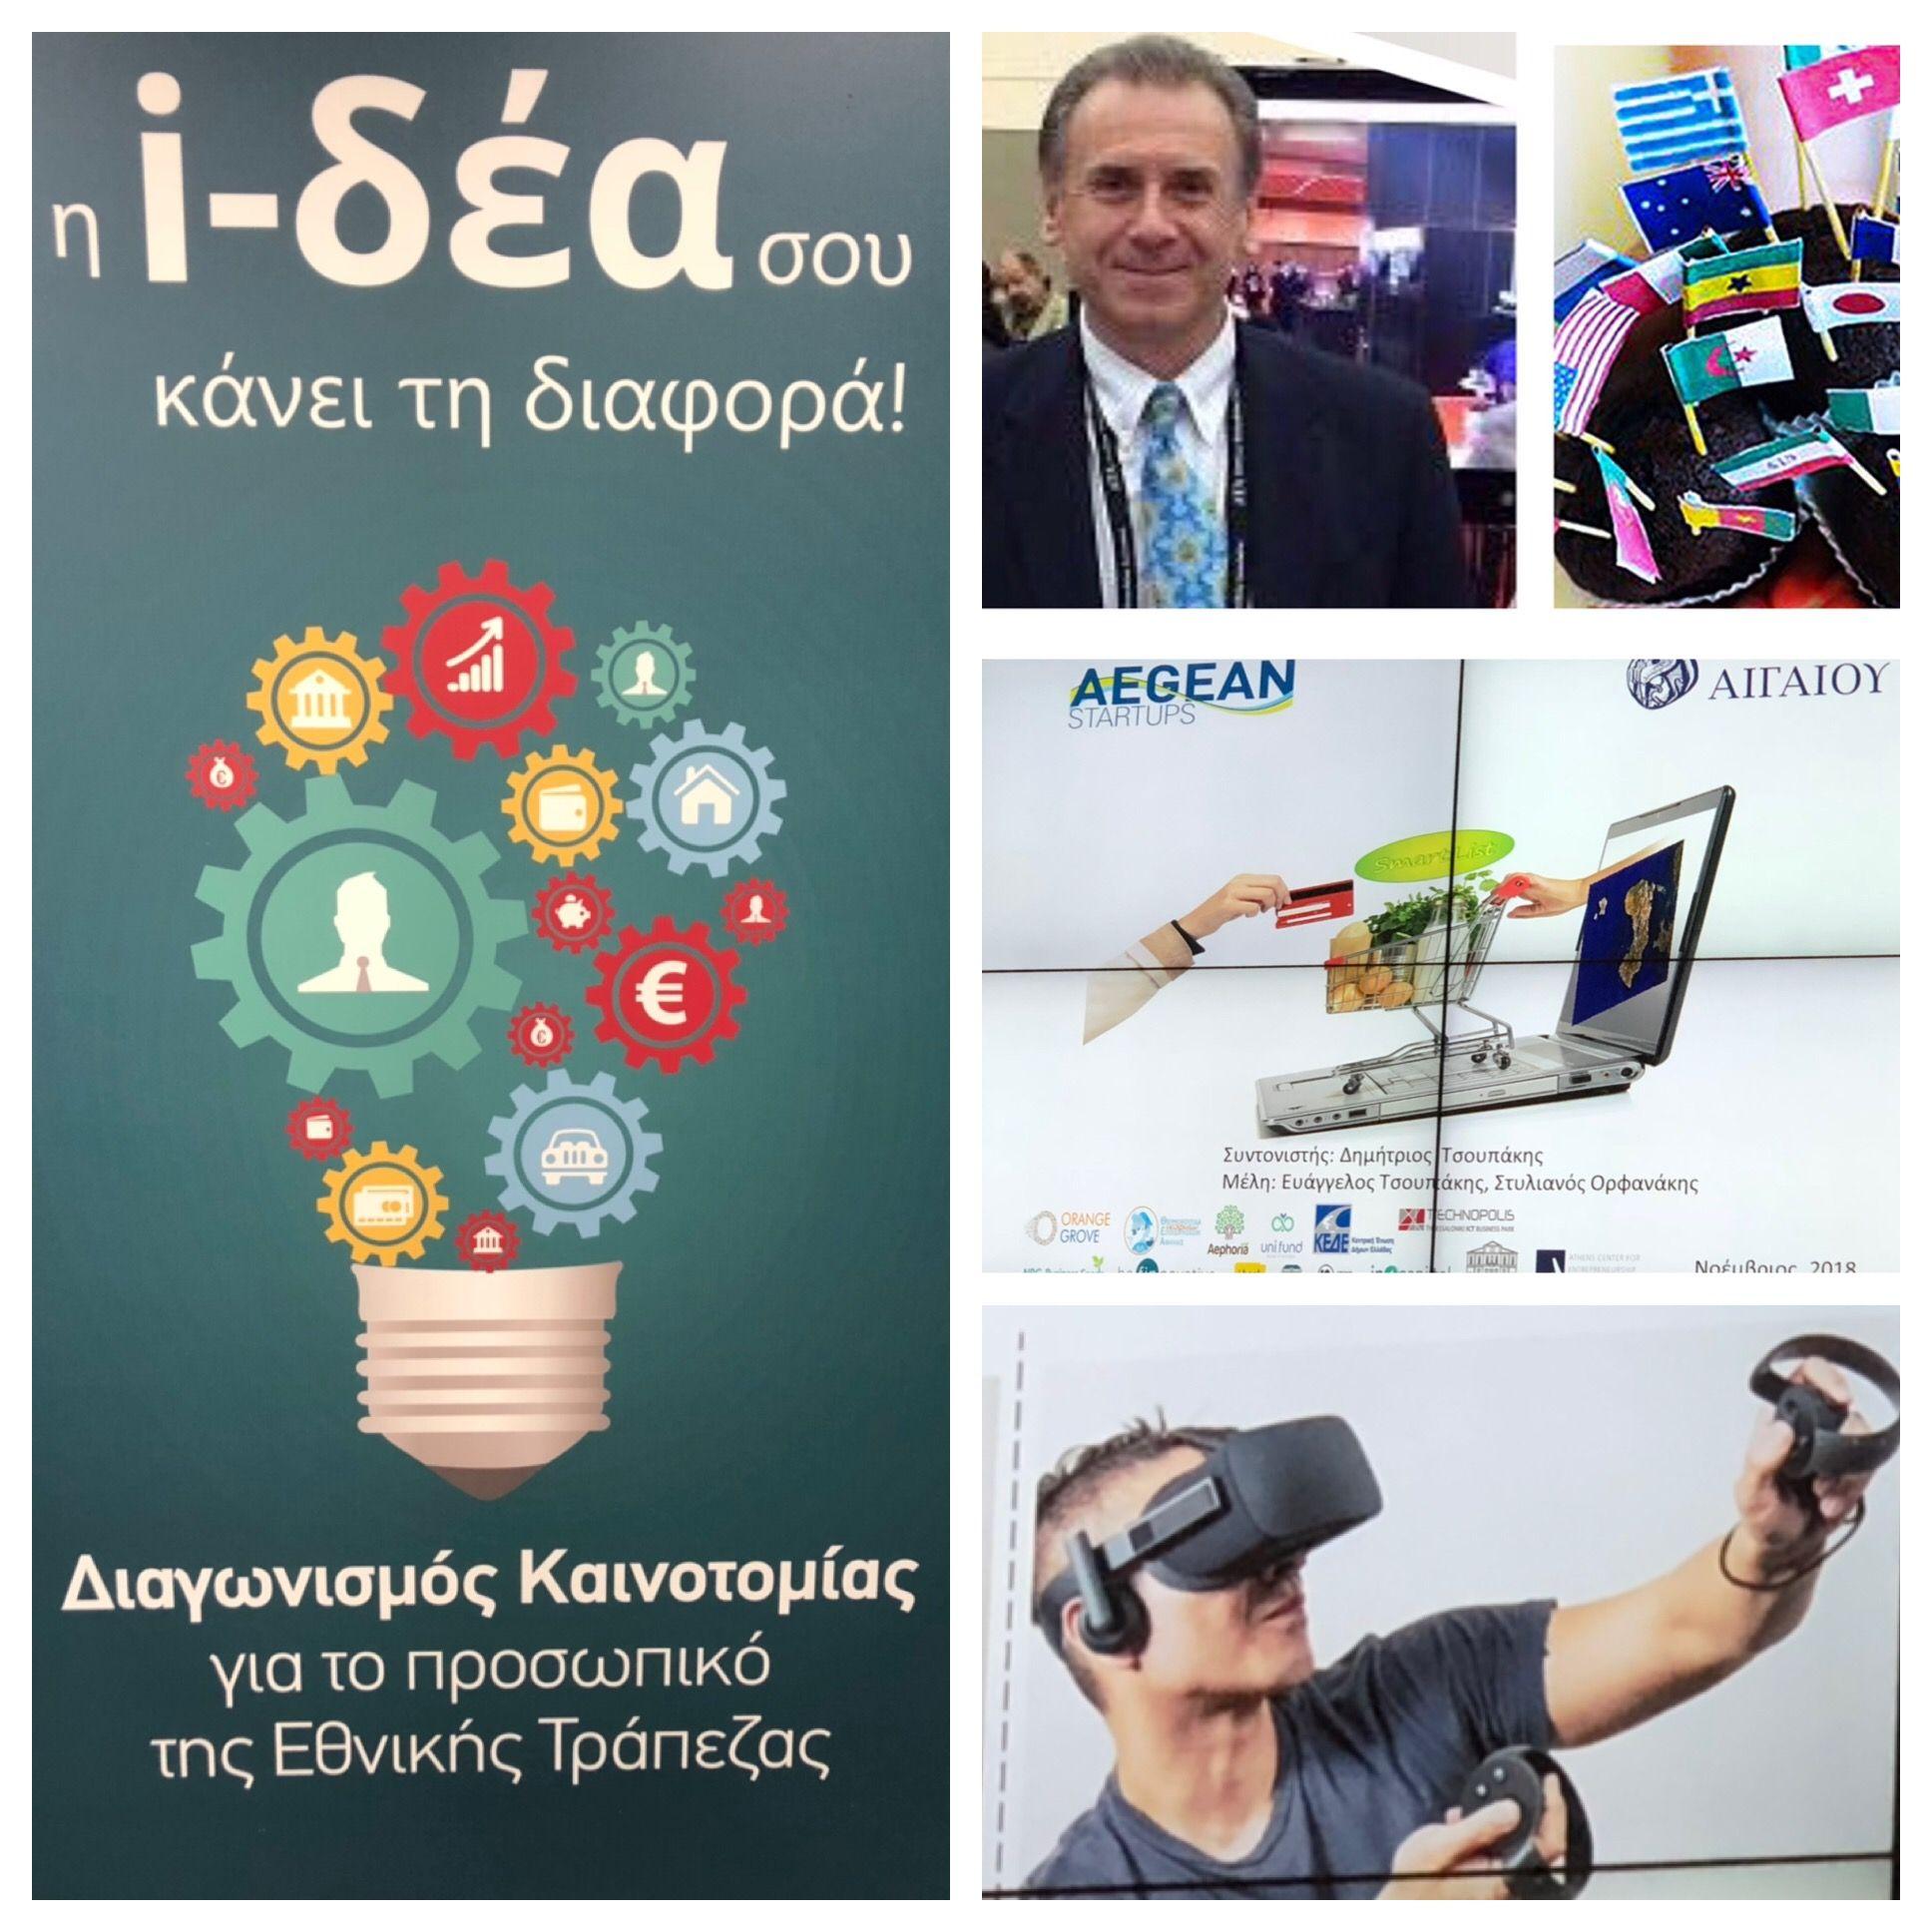 Aegean Startups Finals! University of the Aegean Greece